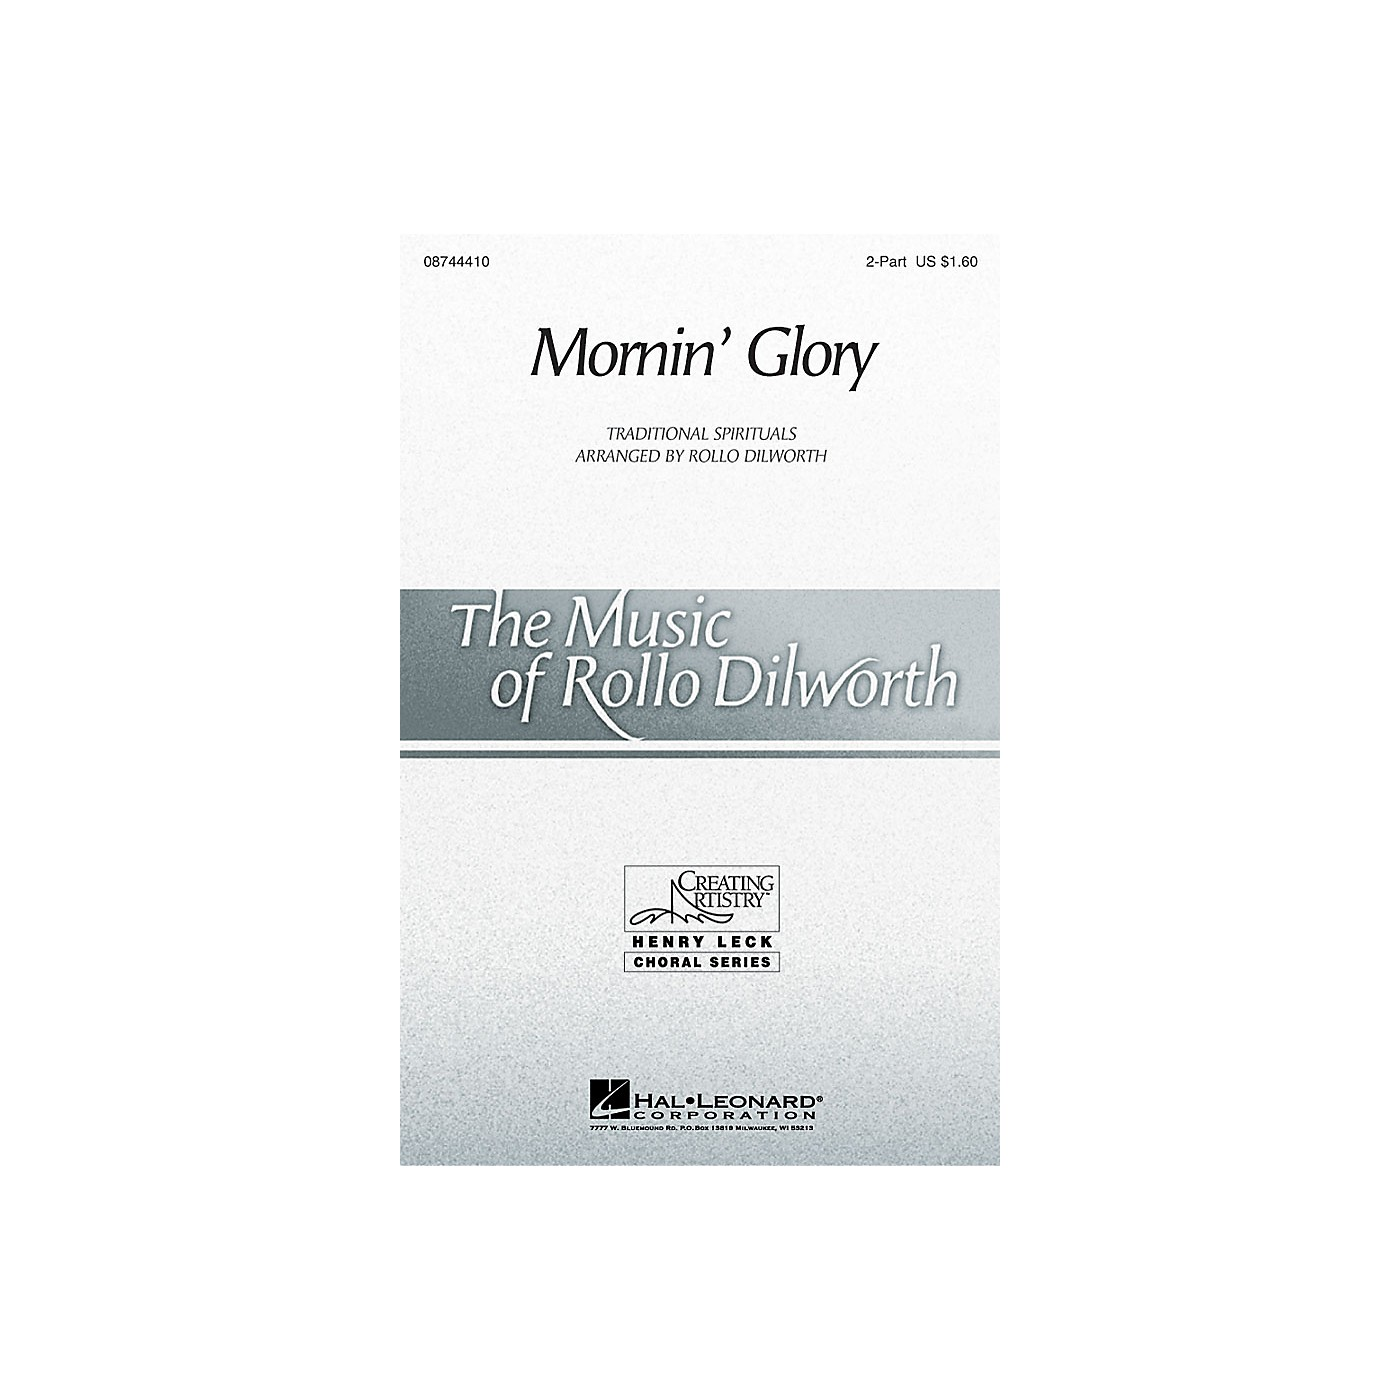 Hal Leonard Mornin' Glory 2-Part arranged by Rollo Dilworth thumbnail